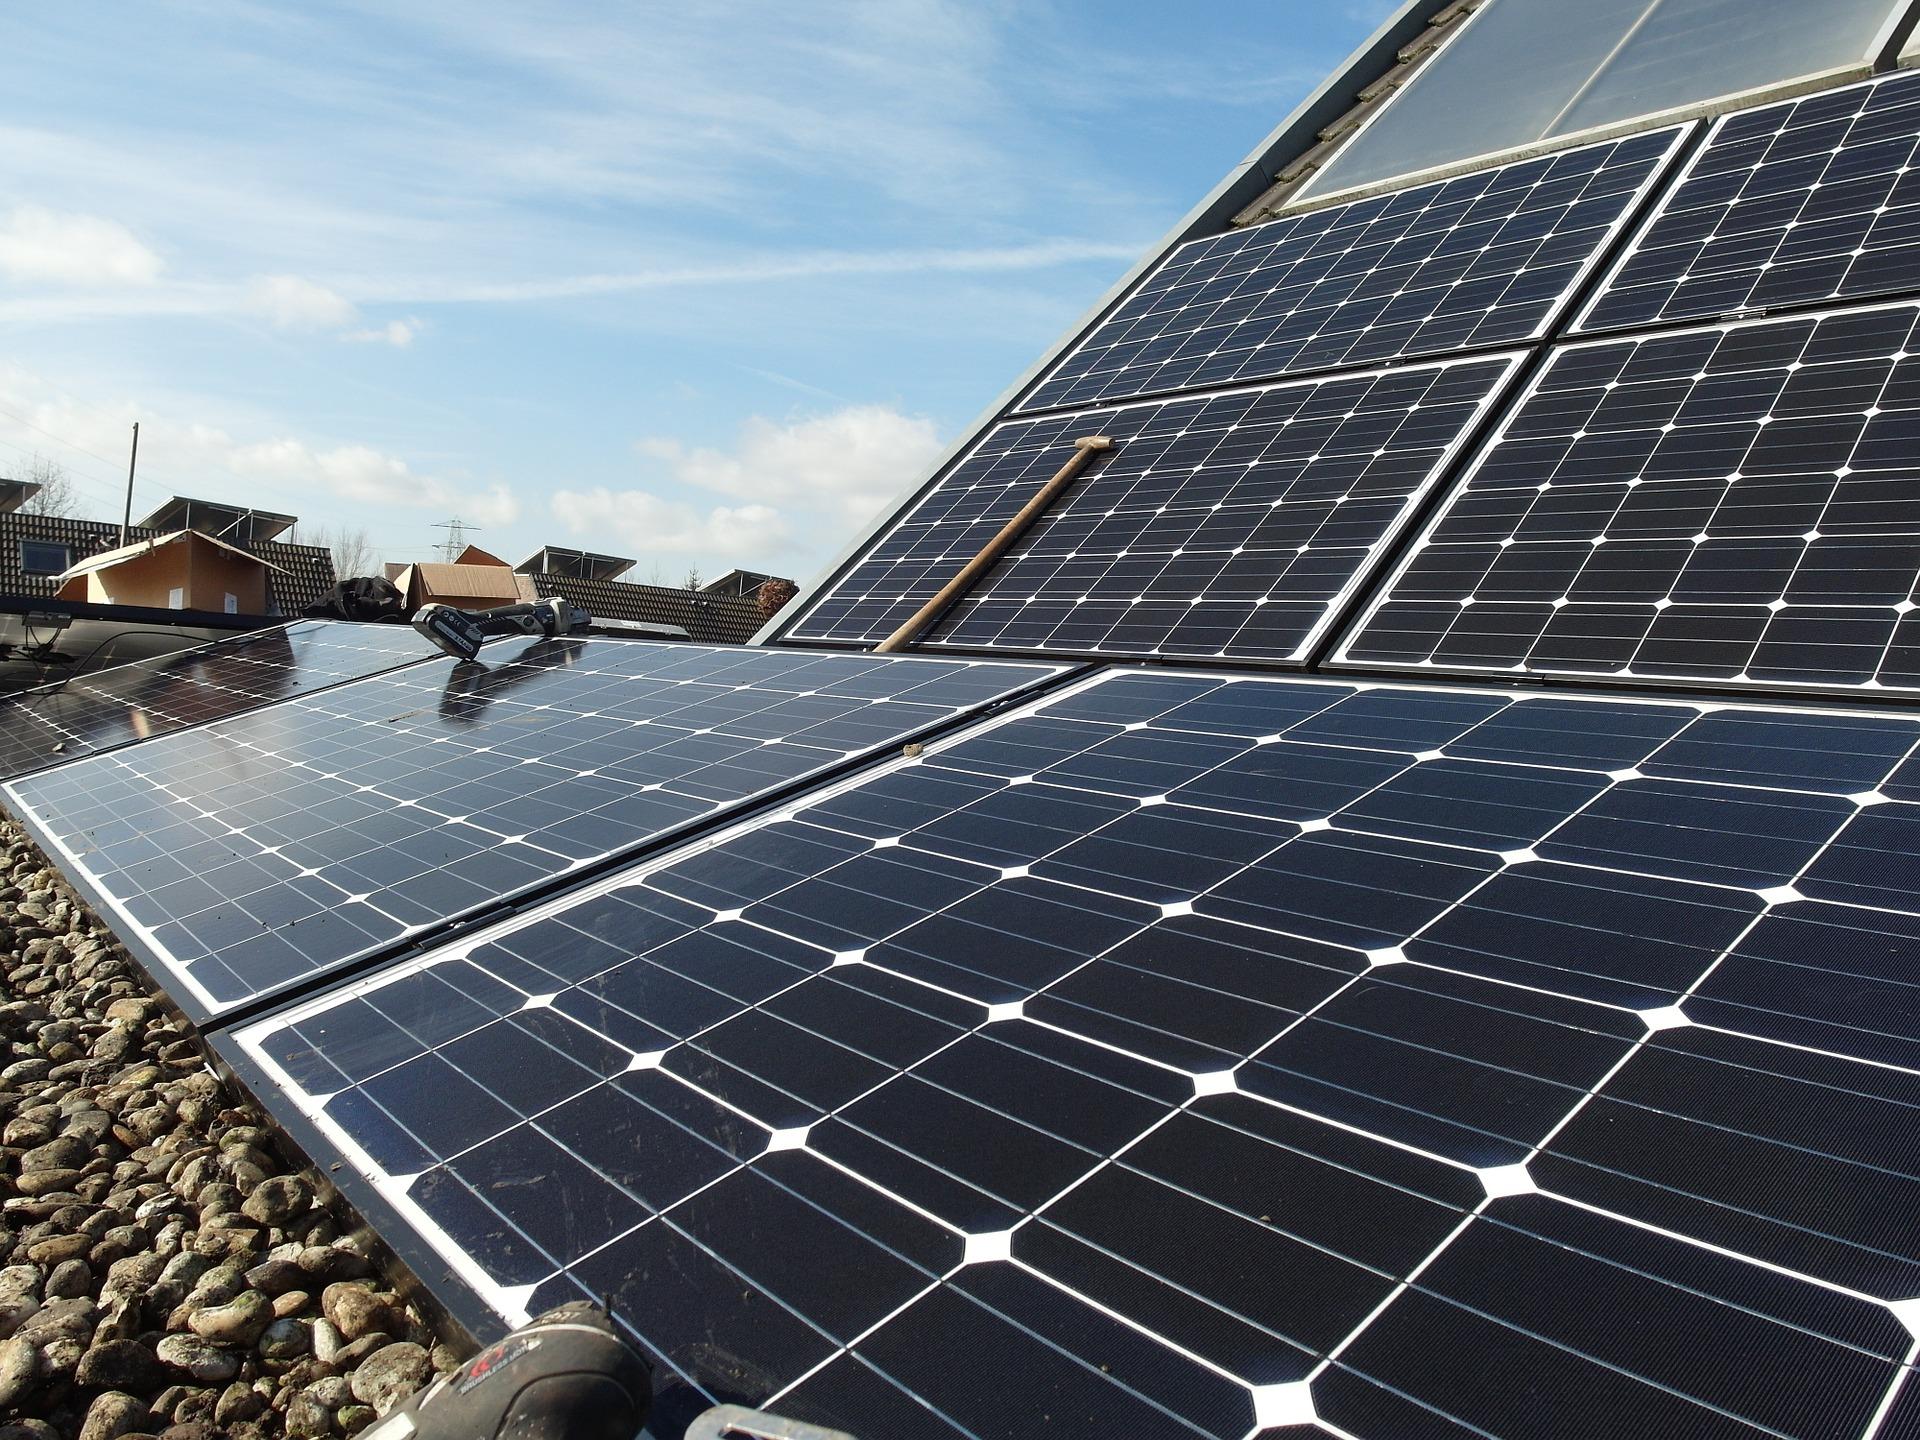 zonnepanelen-verschillende-panelen-plaatsen